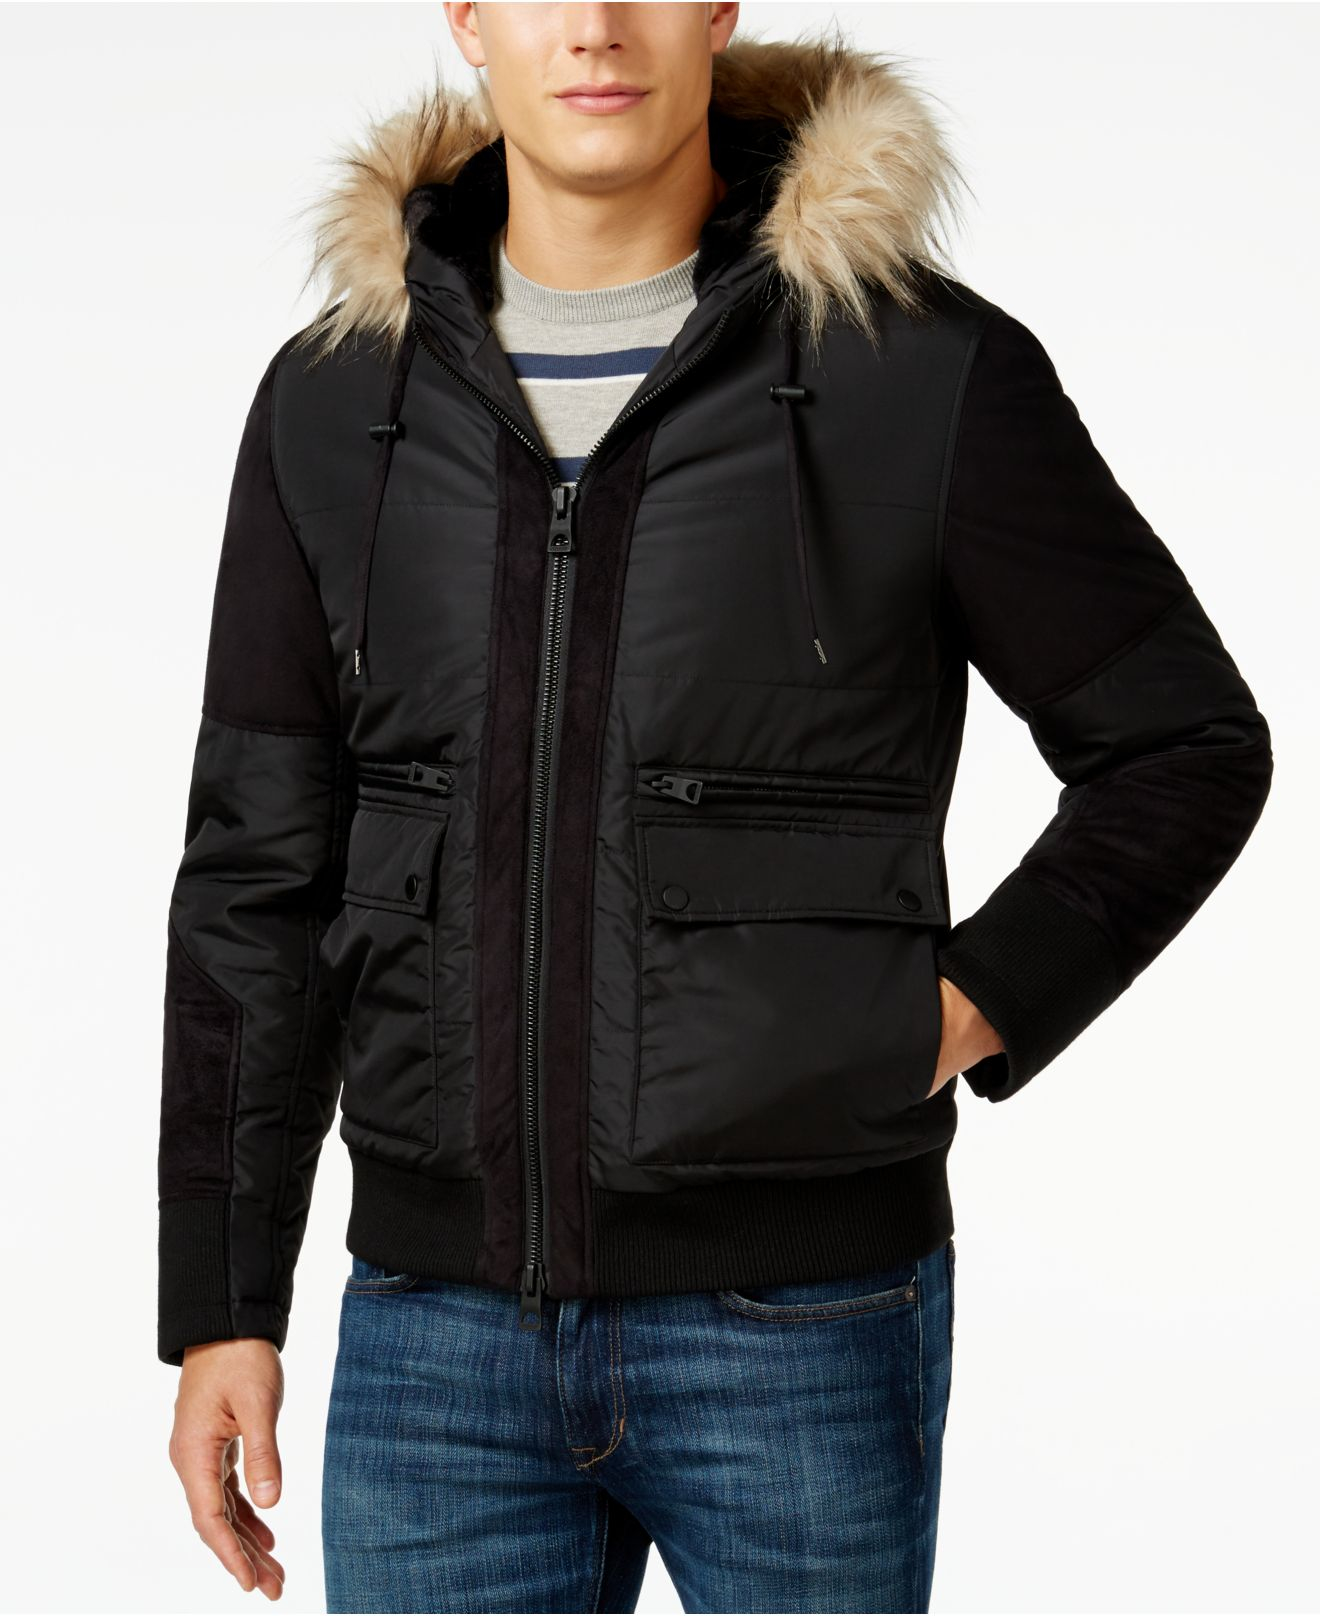 cc4d7845cf92 Lyst - Guess Filmore Faux-fur Hood Puffer Jacket in Black for Men